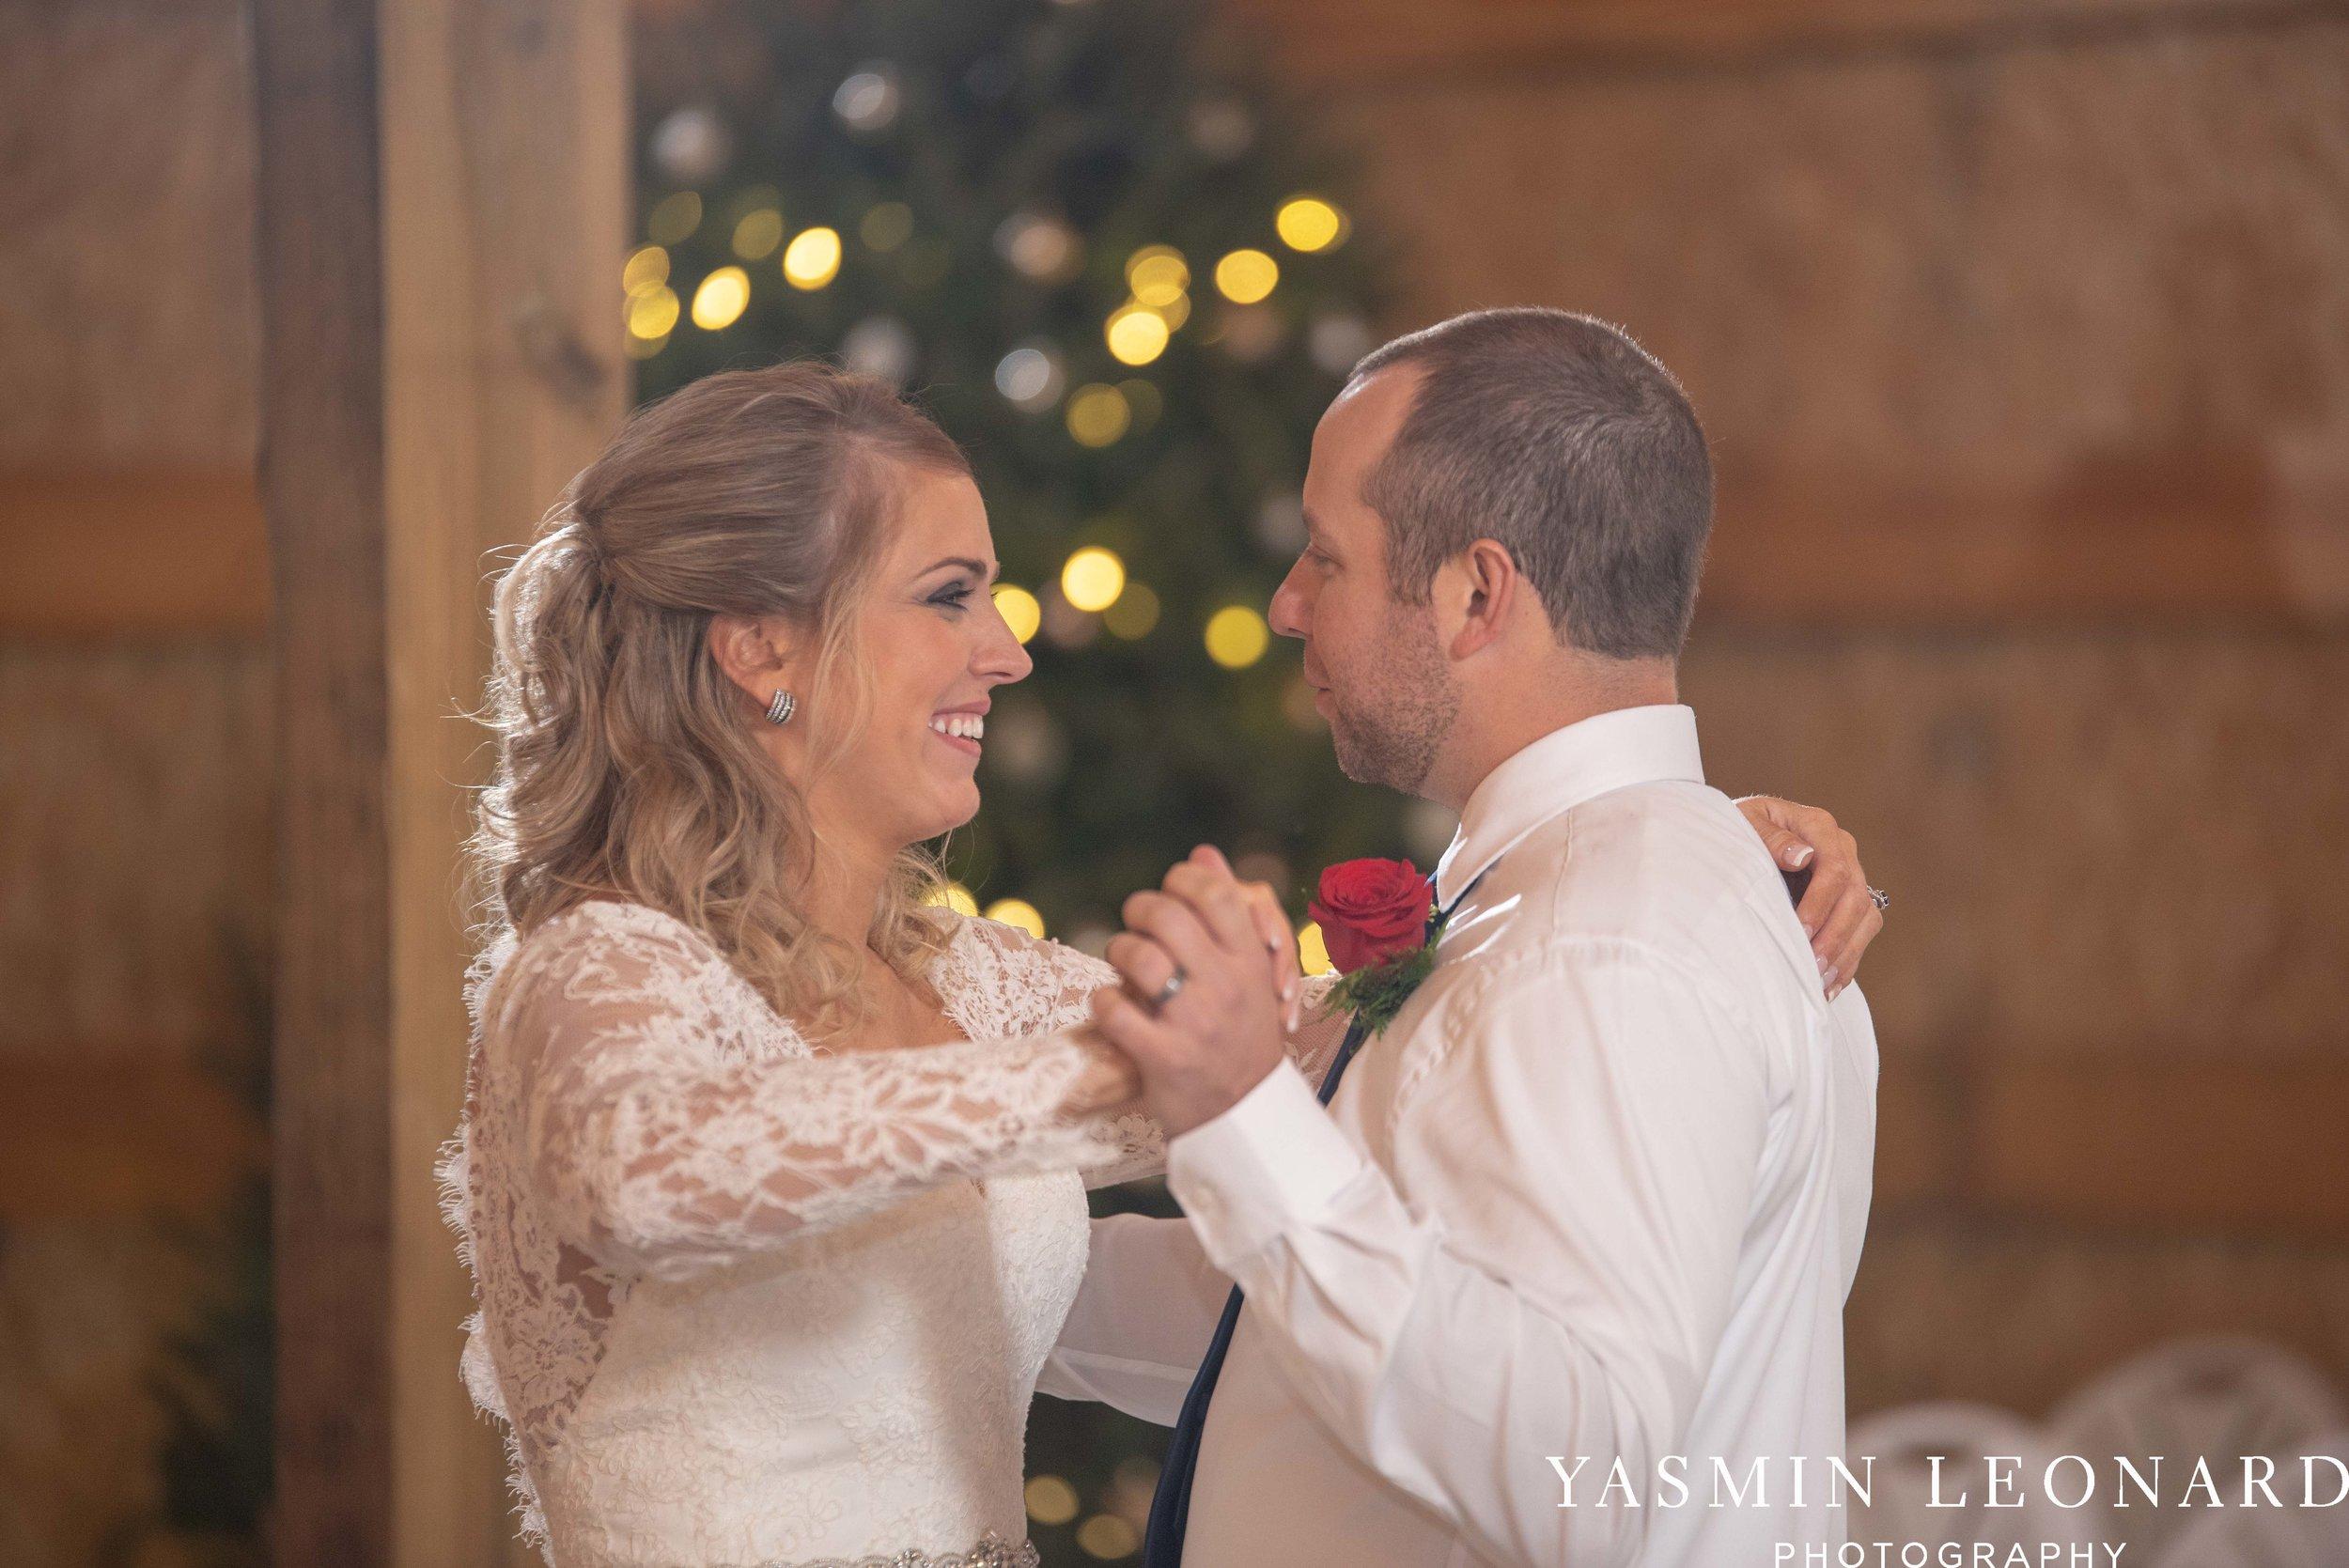 Secret Meadows at Green Dell Farm, NC Barns, NC Wedding Venues, Triad, NC, NC Wedding Photography, Triad Wedding Venues, Affordable Wedding Venues, NEW Wedding Venues, Christmas Weddings-32.jpg